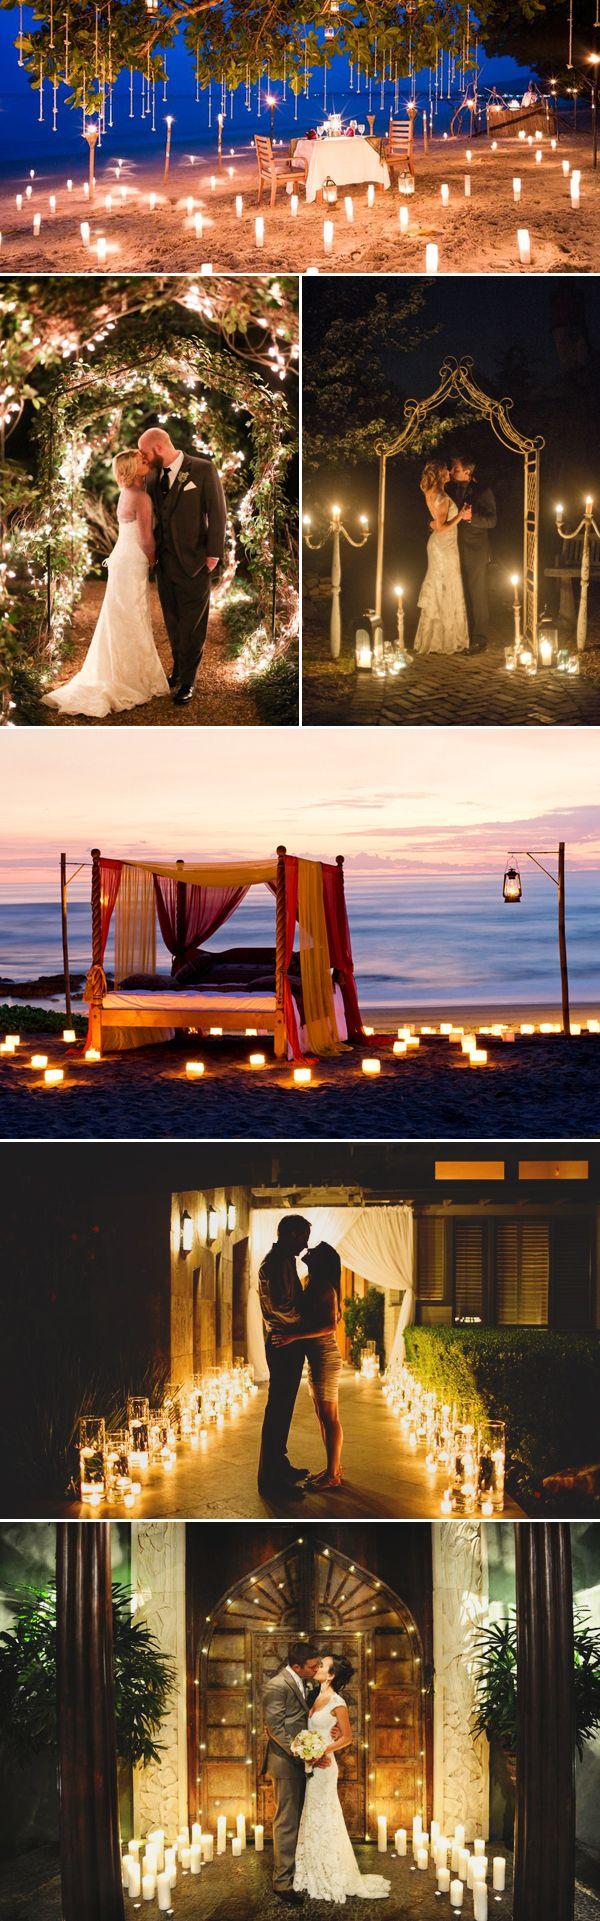 22 Utterly Romantic Candlelight Entrance Decor Ideas - Surrounding Lights